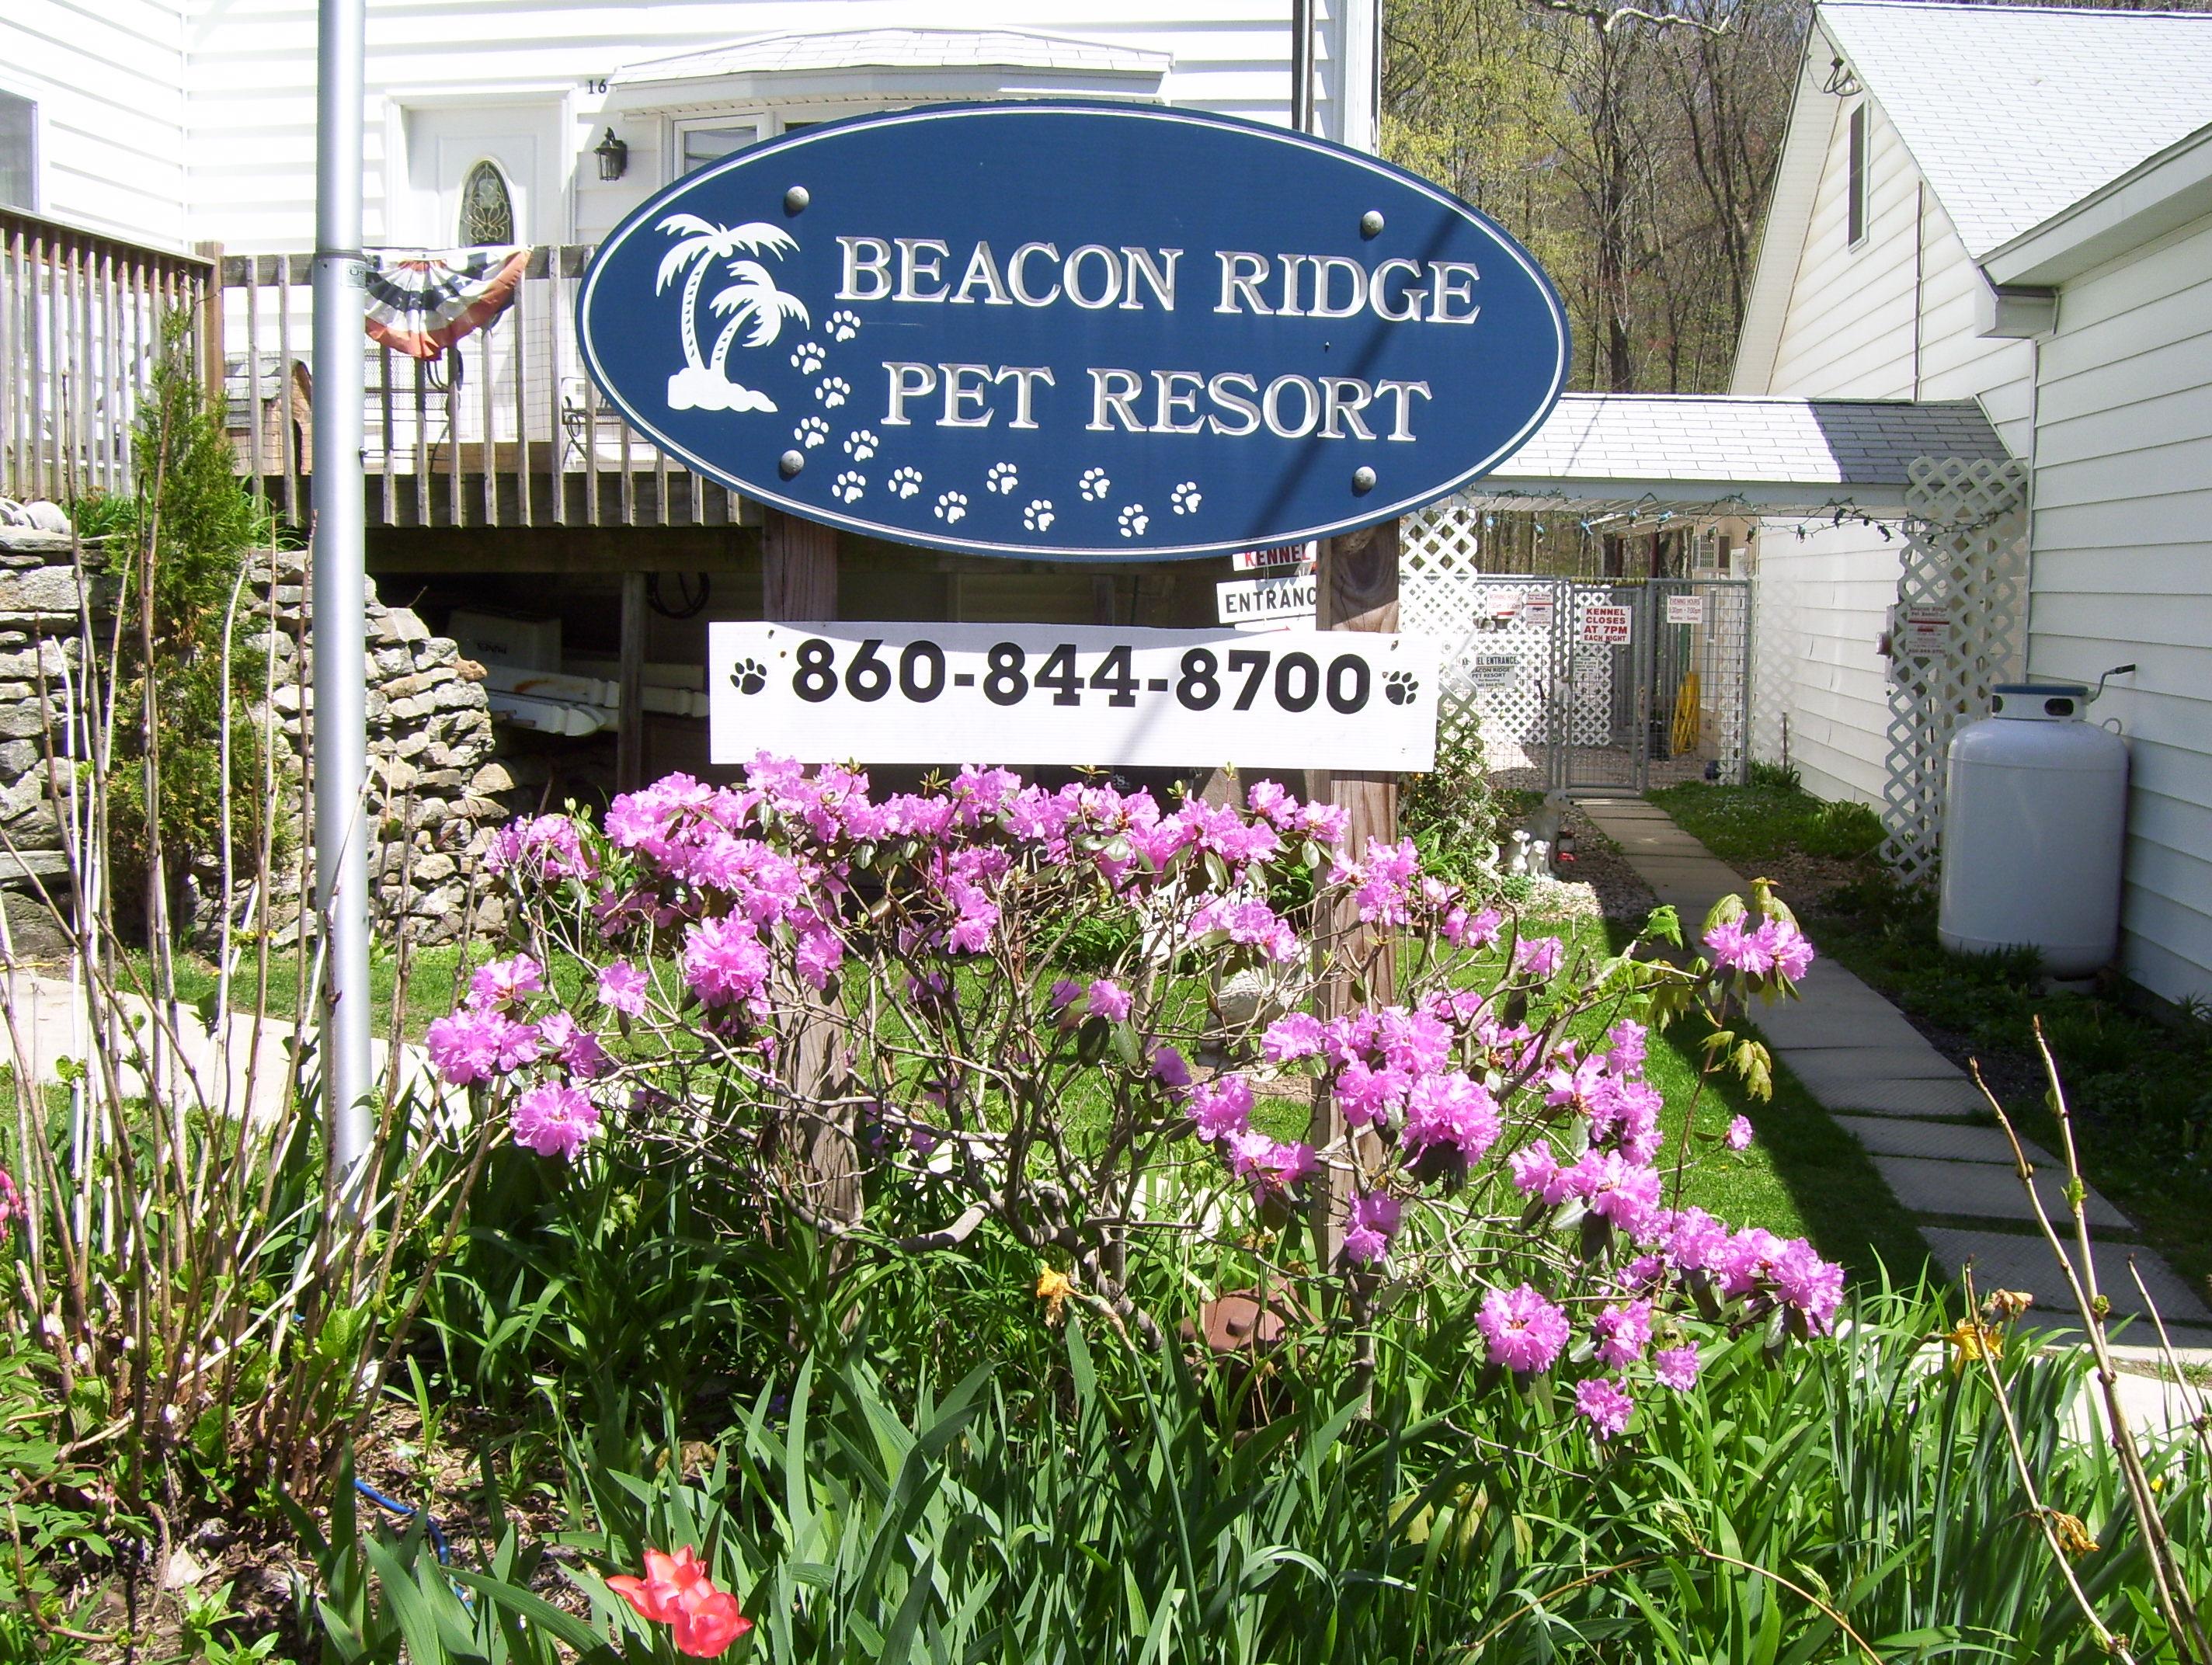 Pet Friendly Beacon Ridge Pet Resort